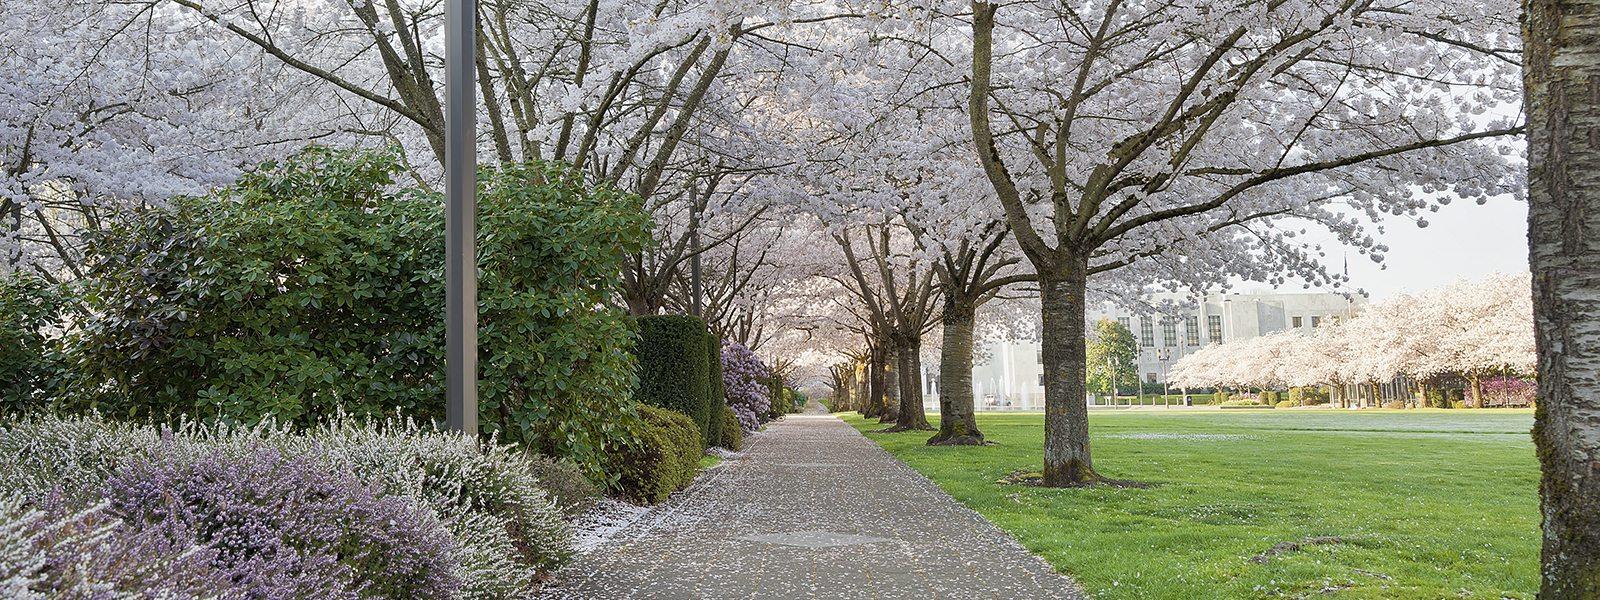 salem-or-cherry-tree-shutterstock_183518681-1600x600